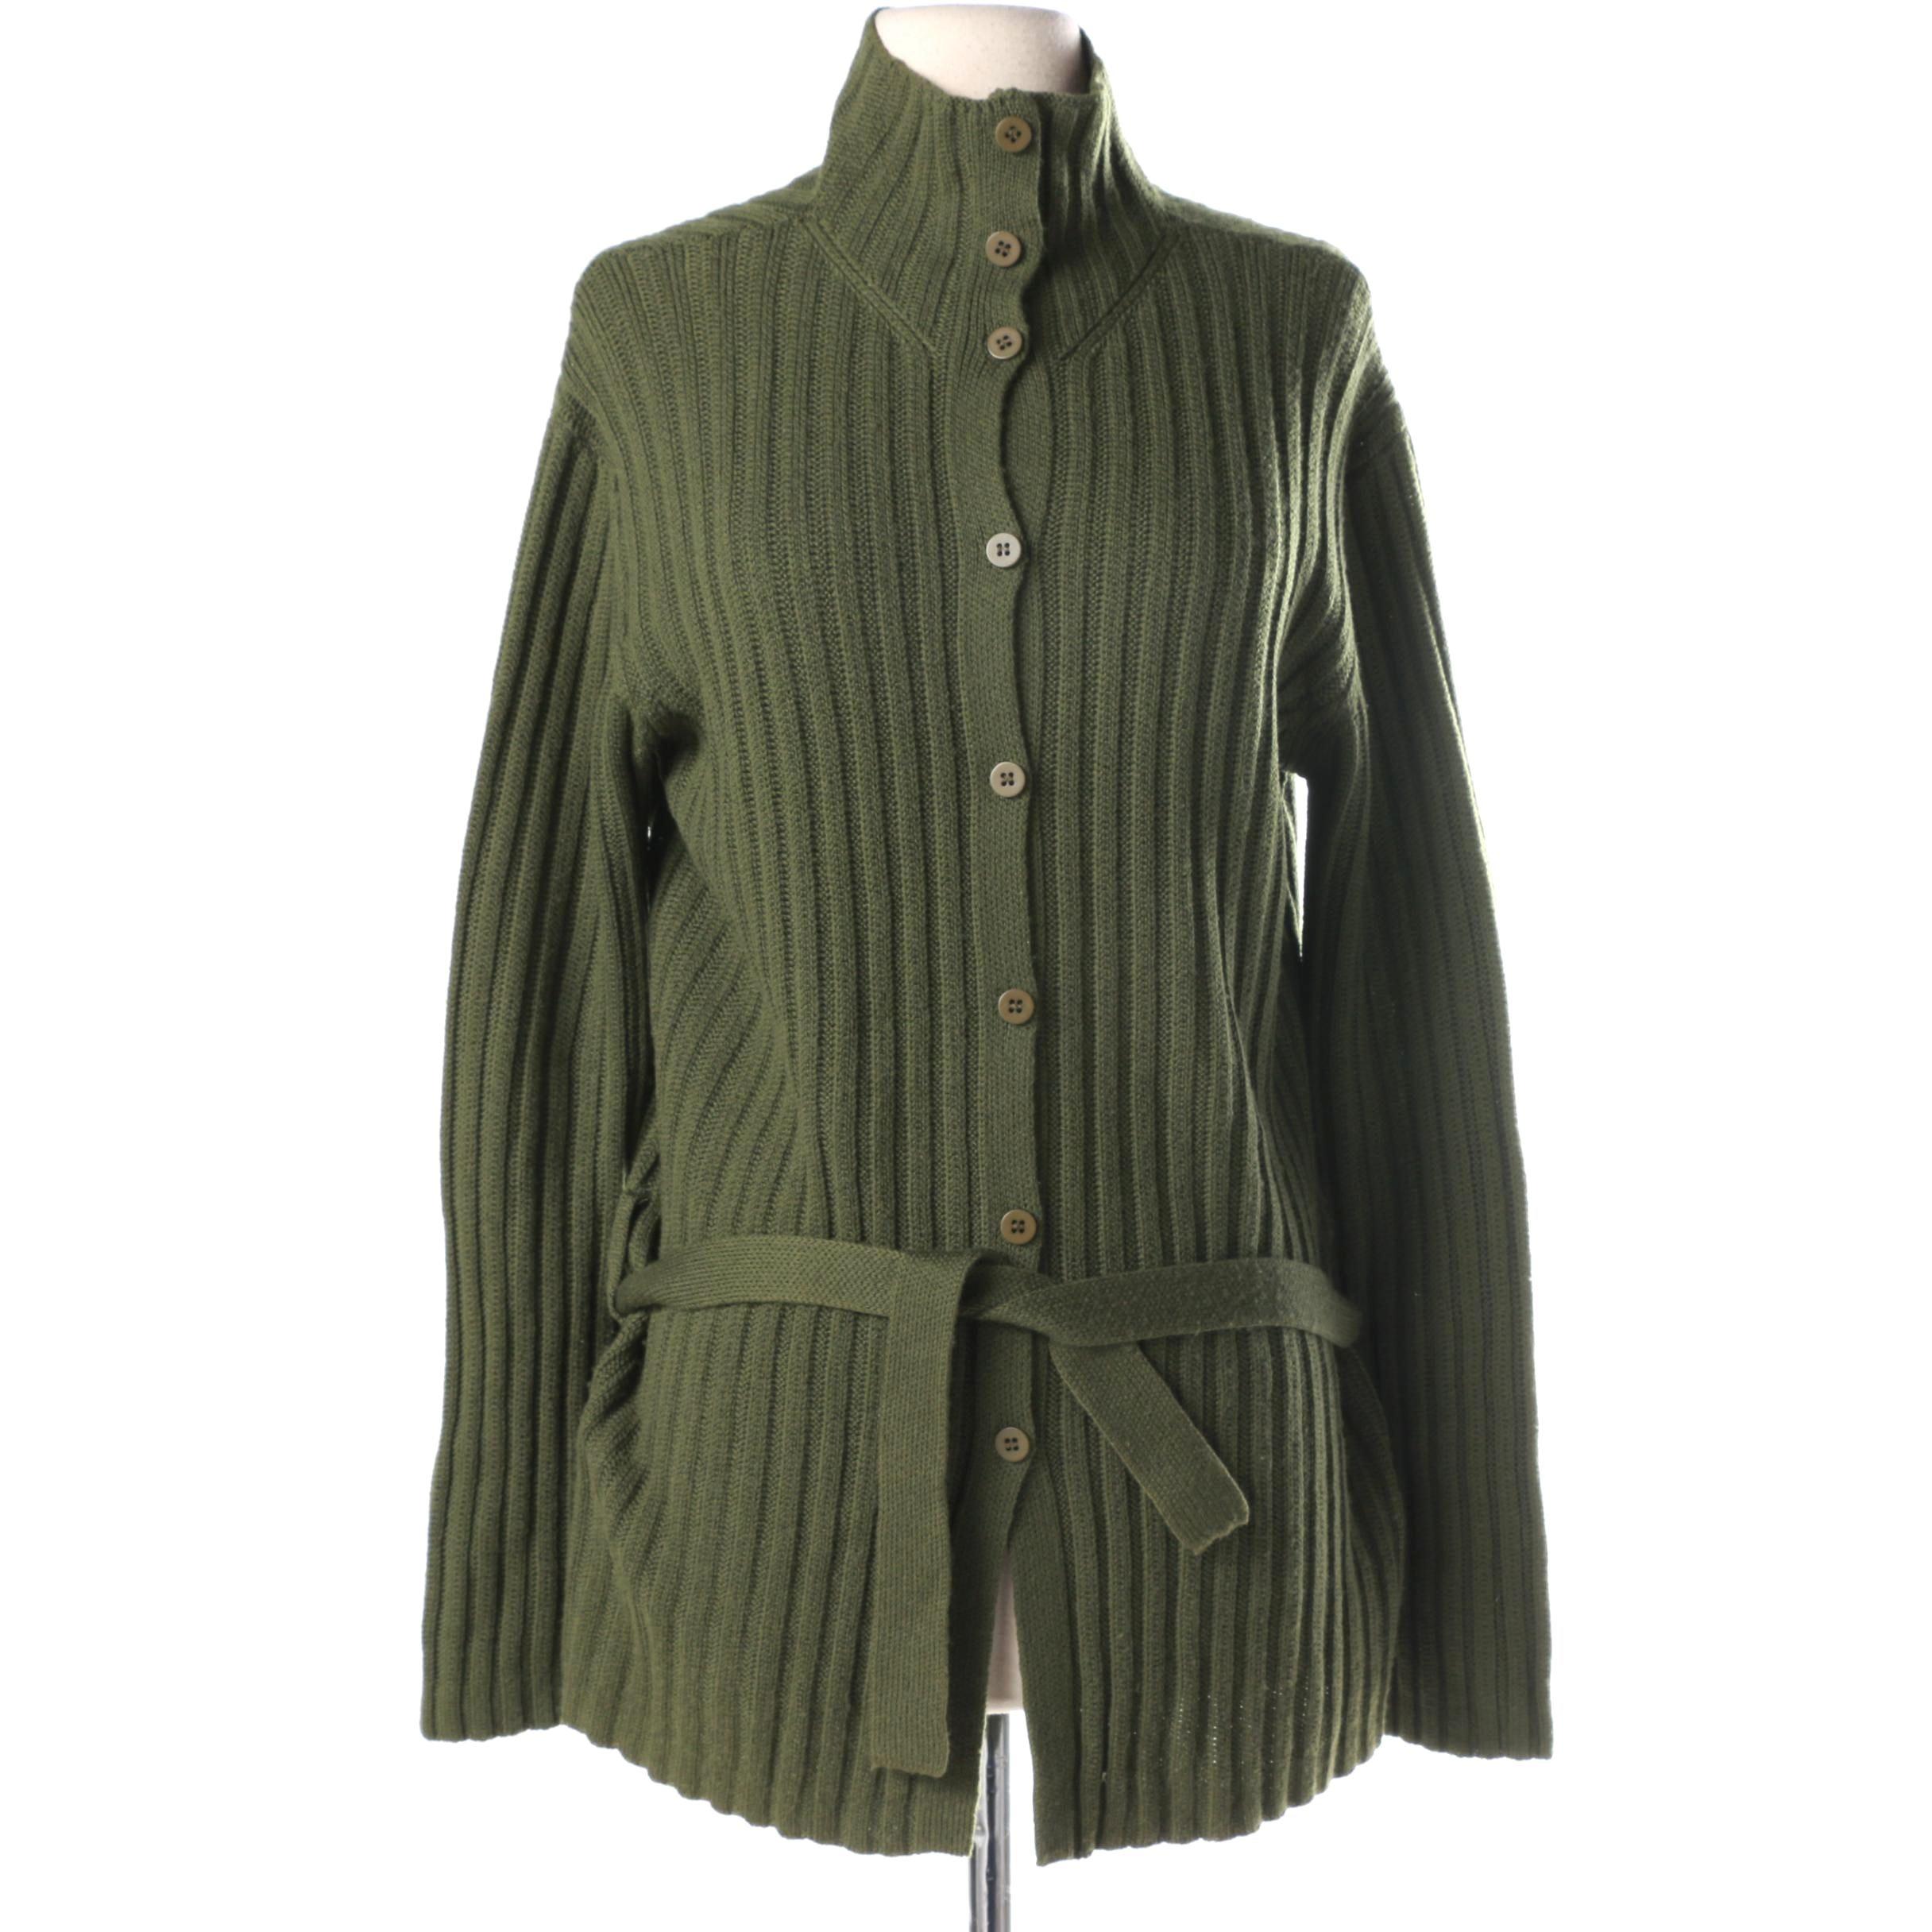 Armani Collezioni Women's Merino Wool Cardigan